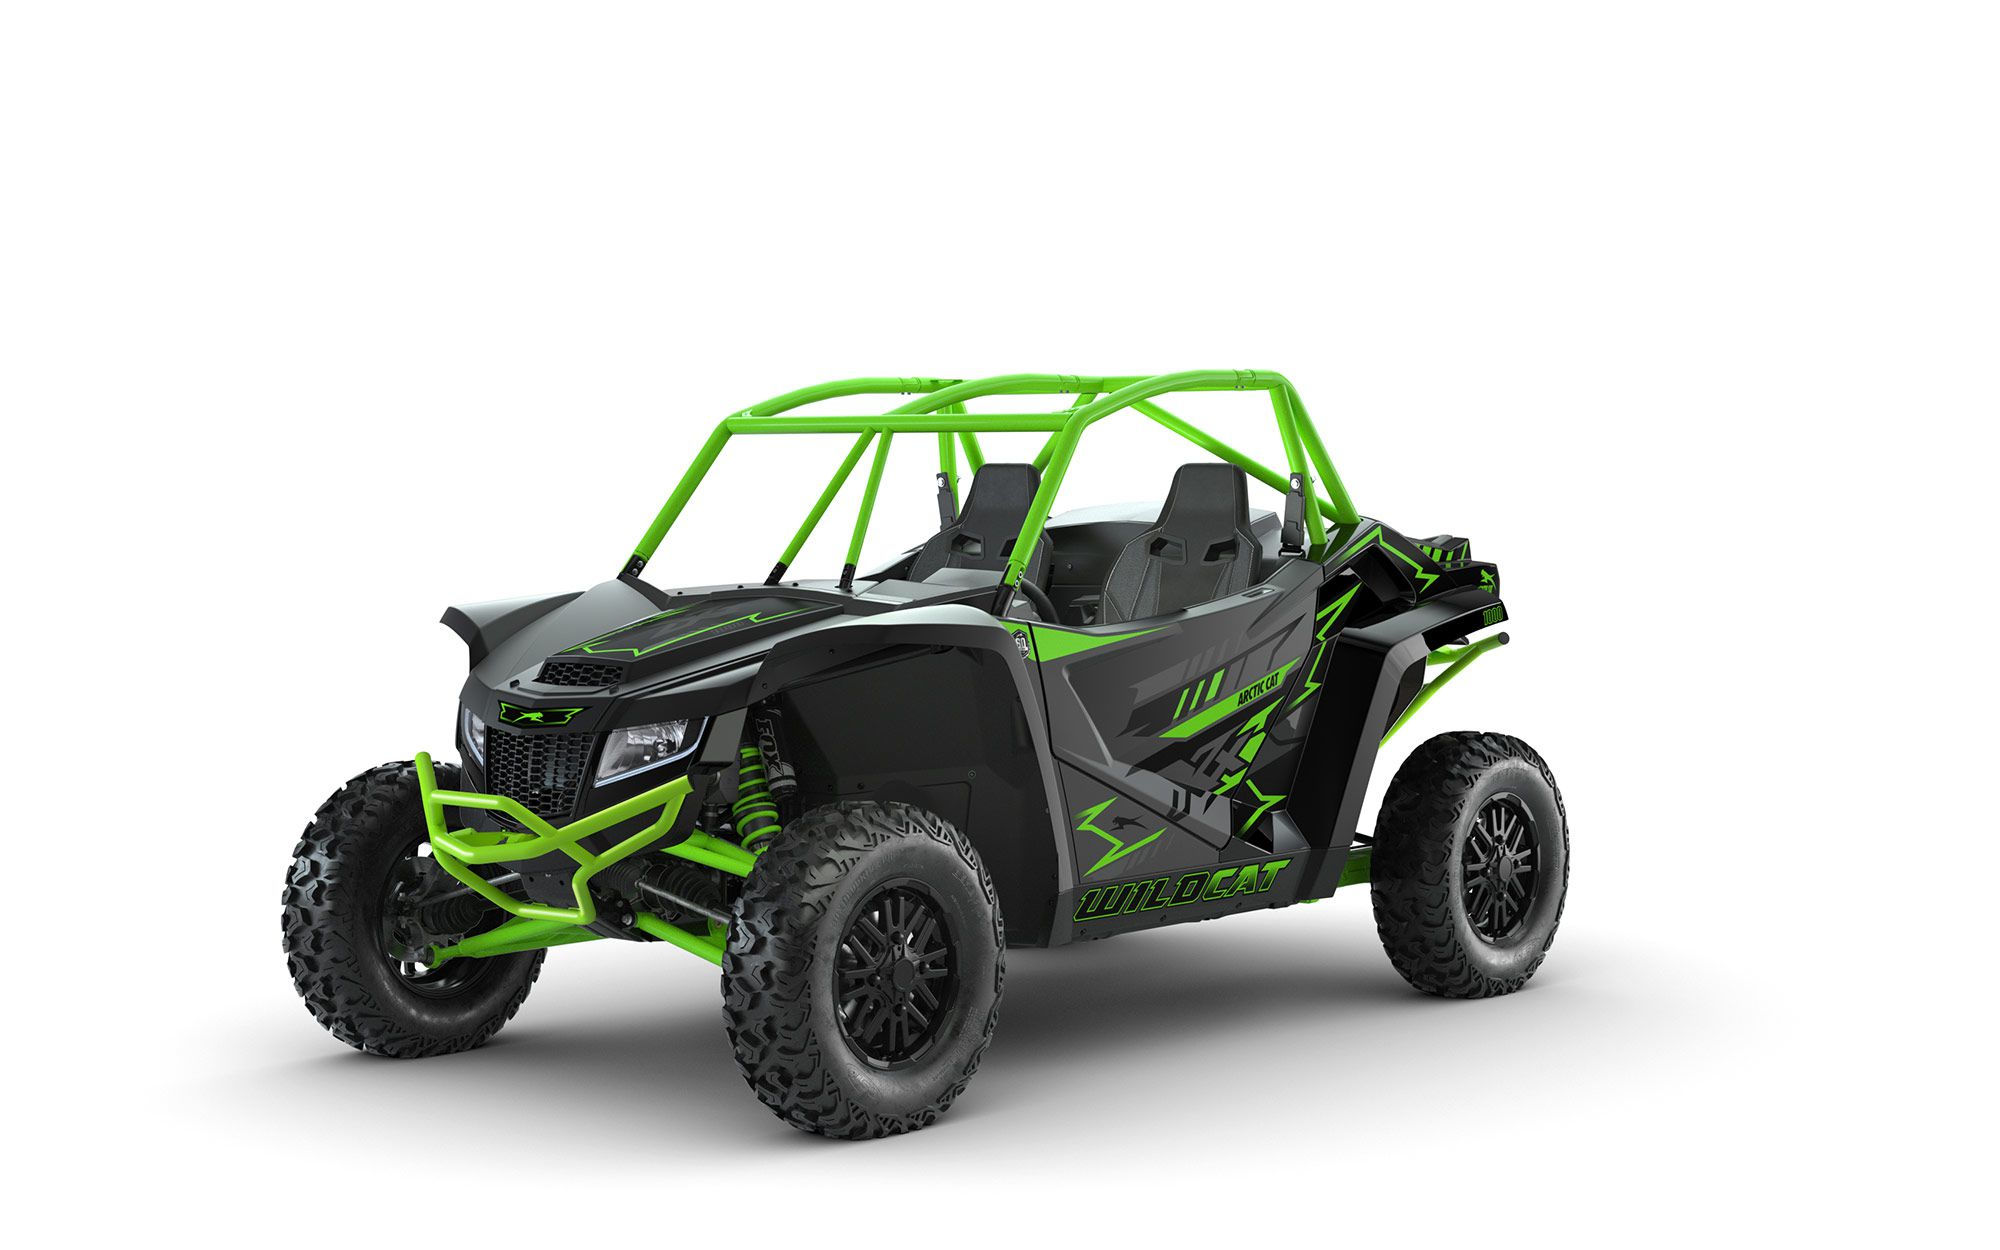 2022 Arctic Cat Wildcat XX LTD model in Black.